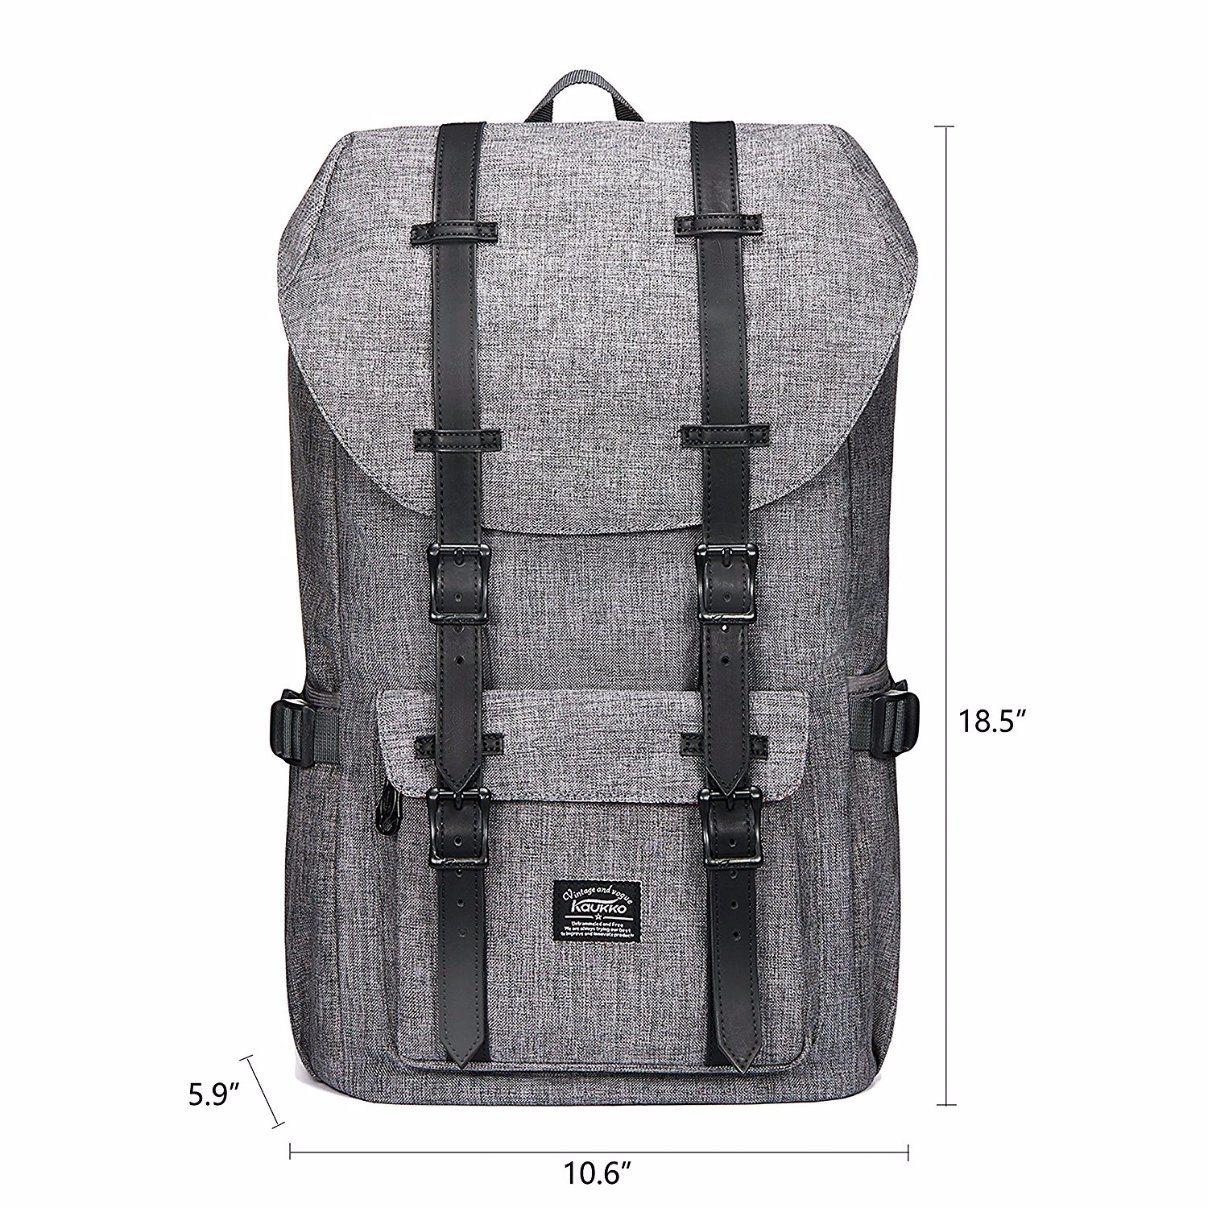 Laptop Outdoor Travel Hiking Camping Casual Large College School Herschel Rucksack/Backpack